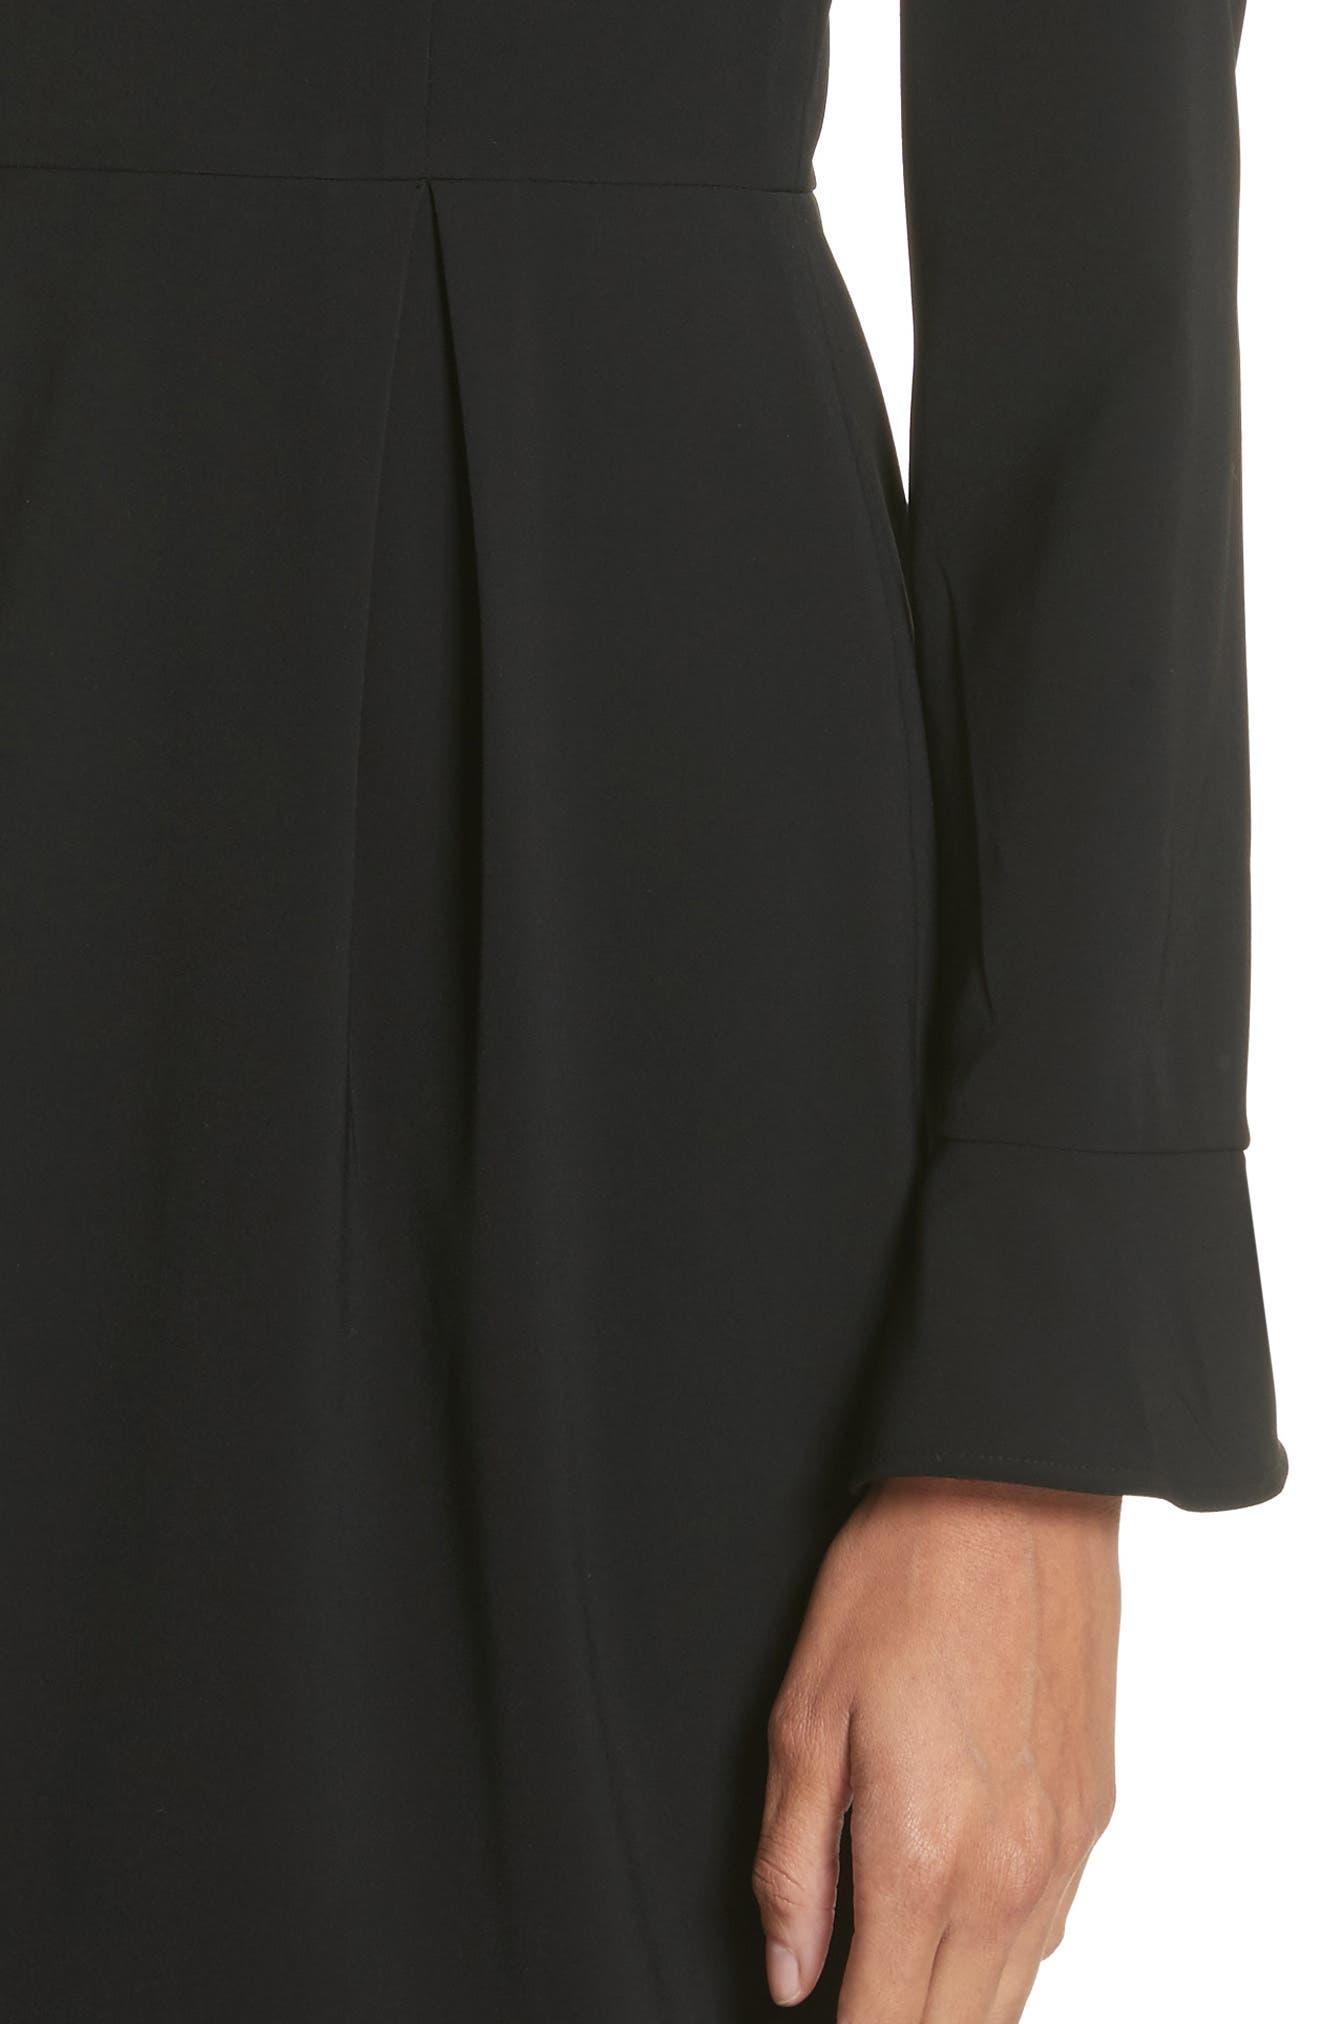 Yulid Flare Cuff Pencil Dress,                             Alternate thumbnail 4, color,                             001